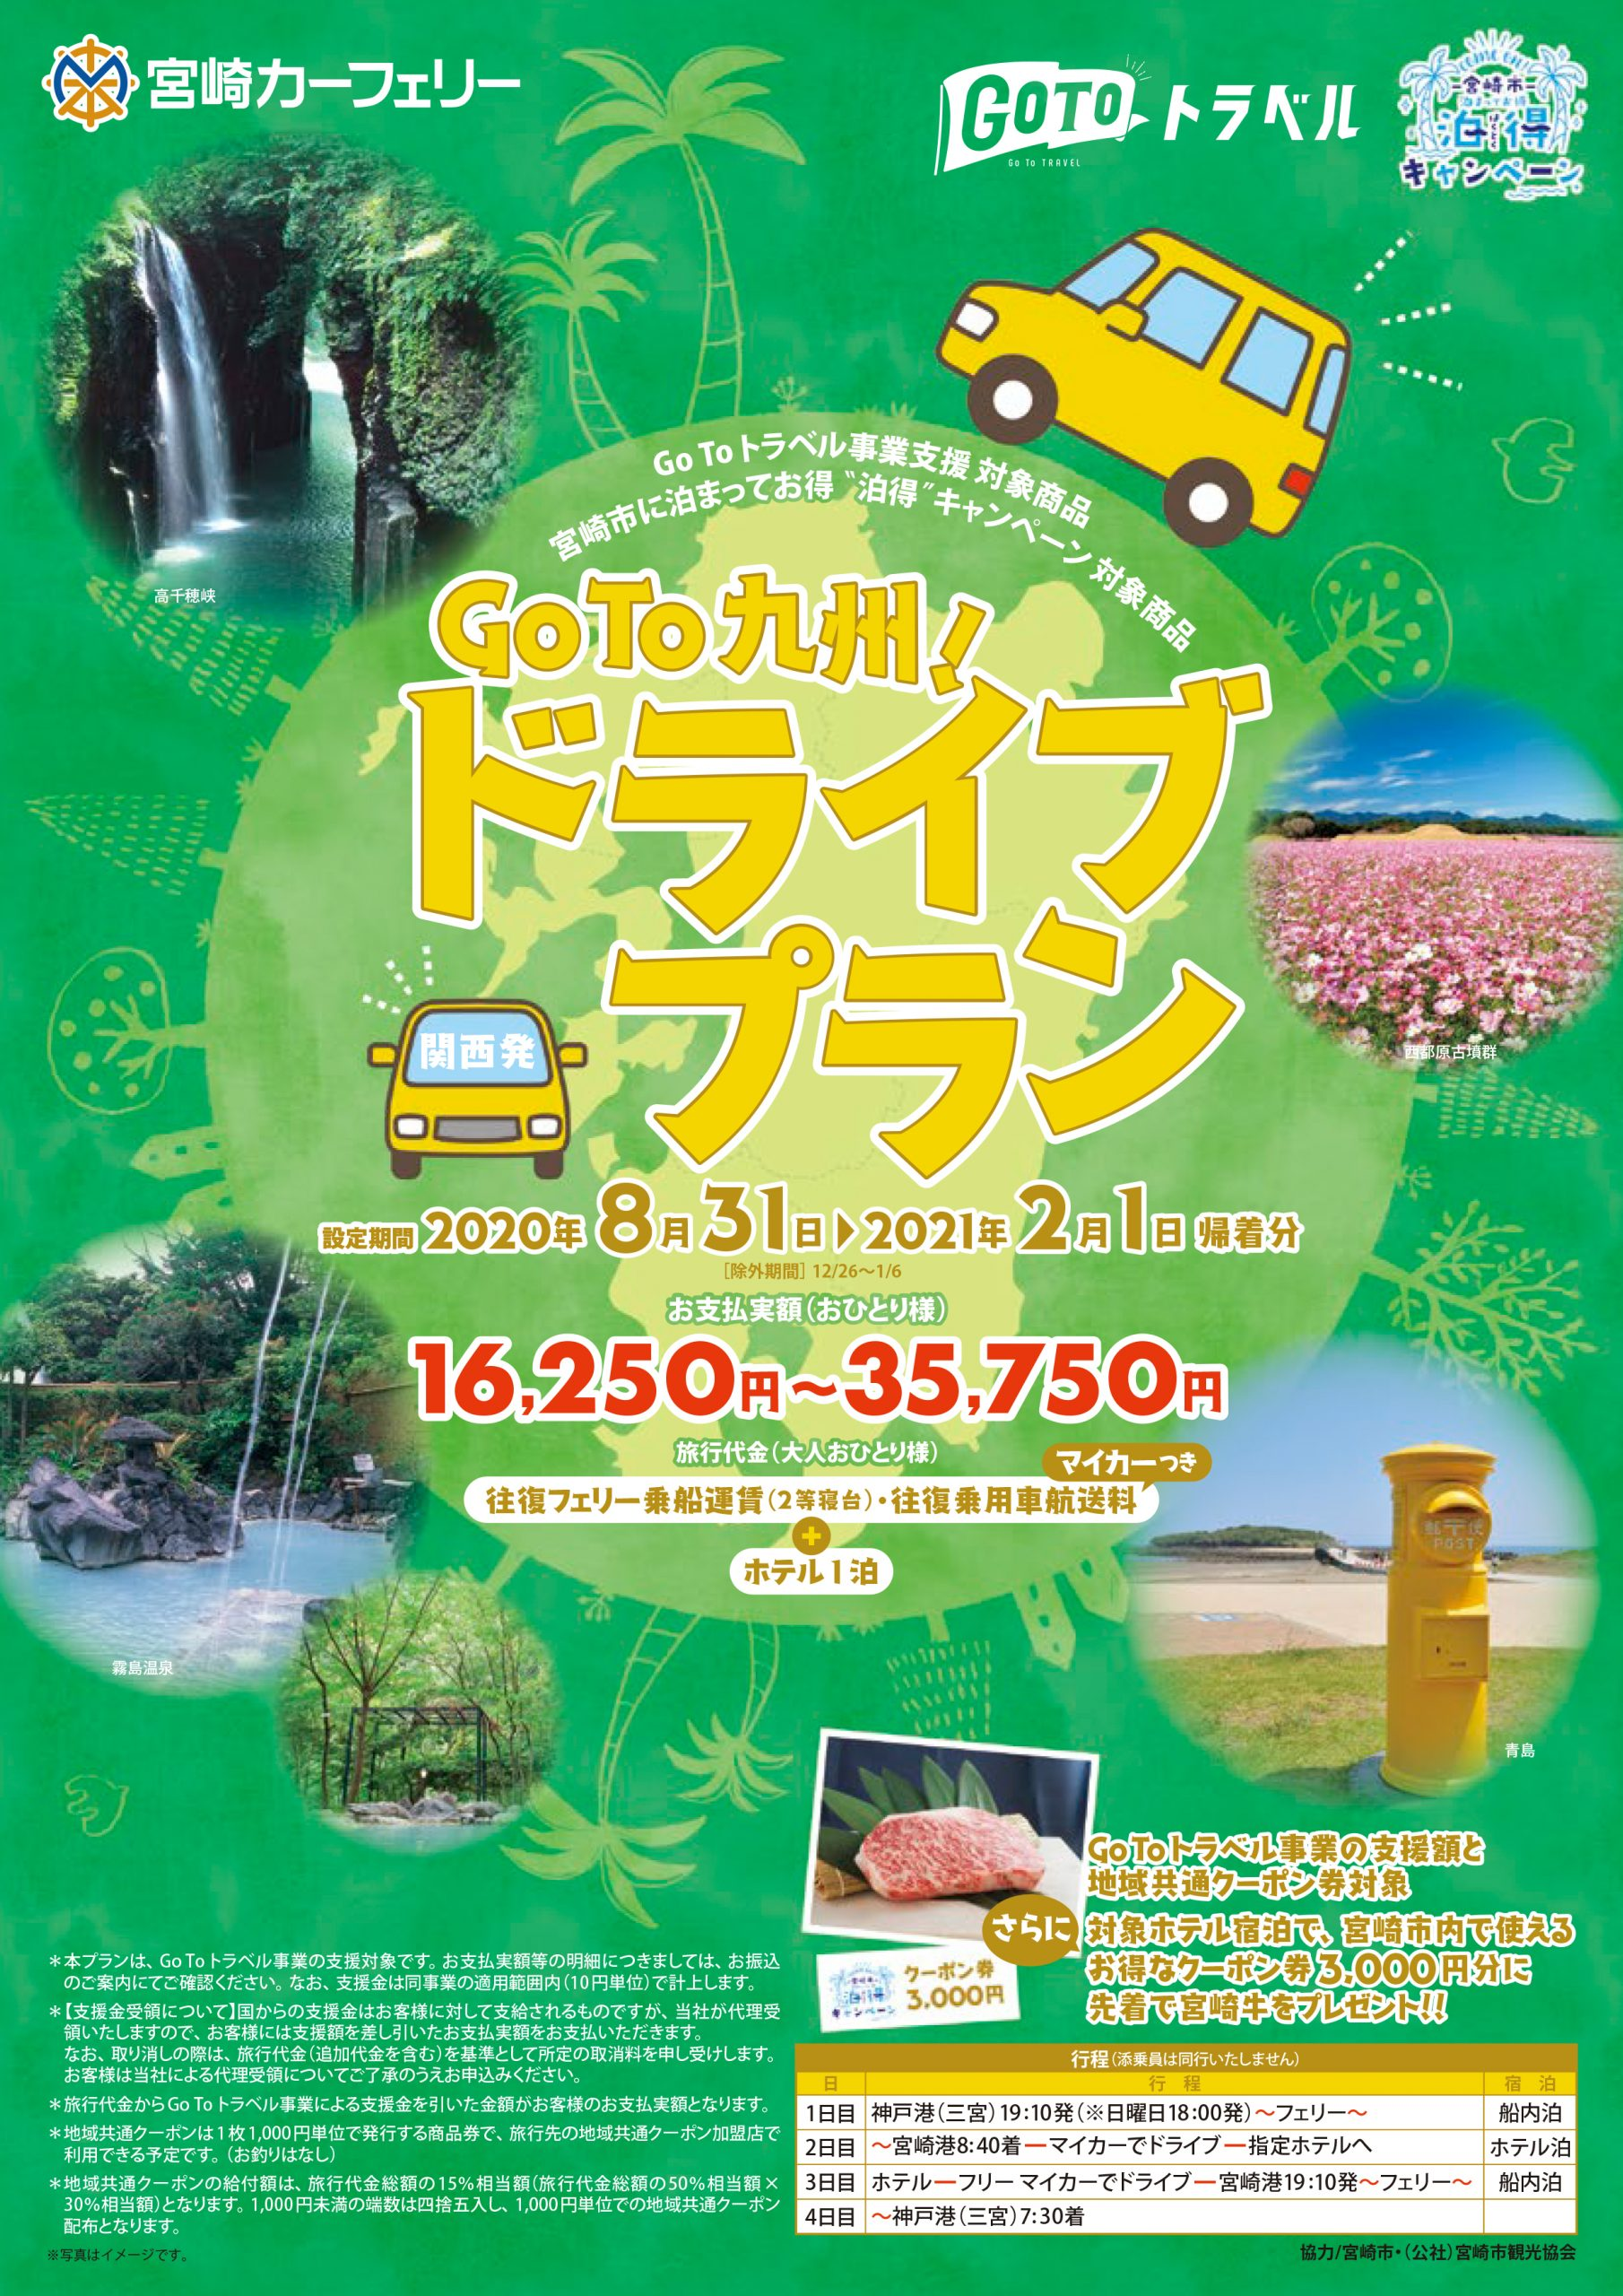 GoTo九州!ドライブプラン